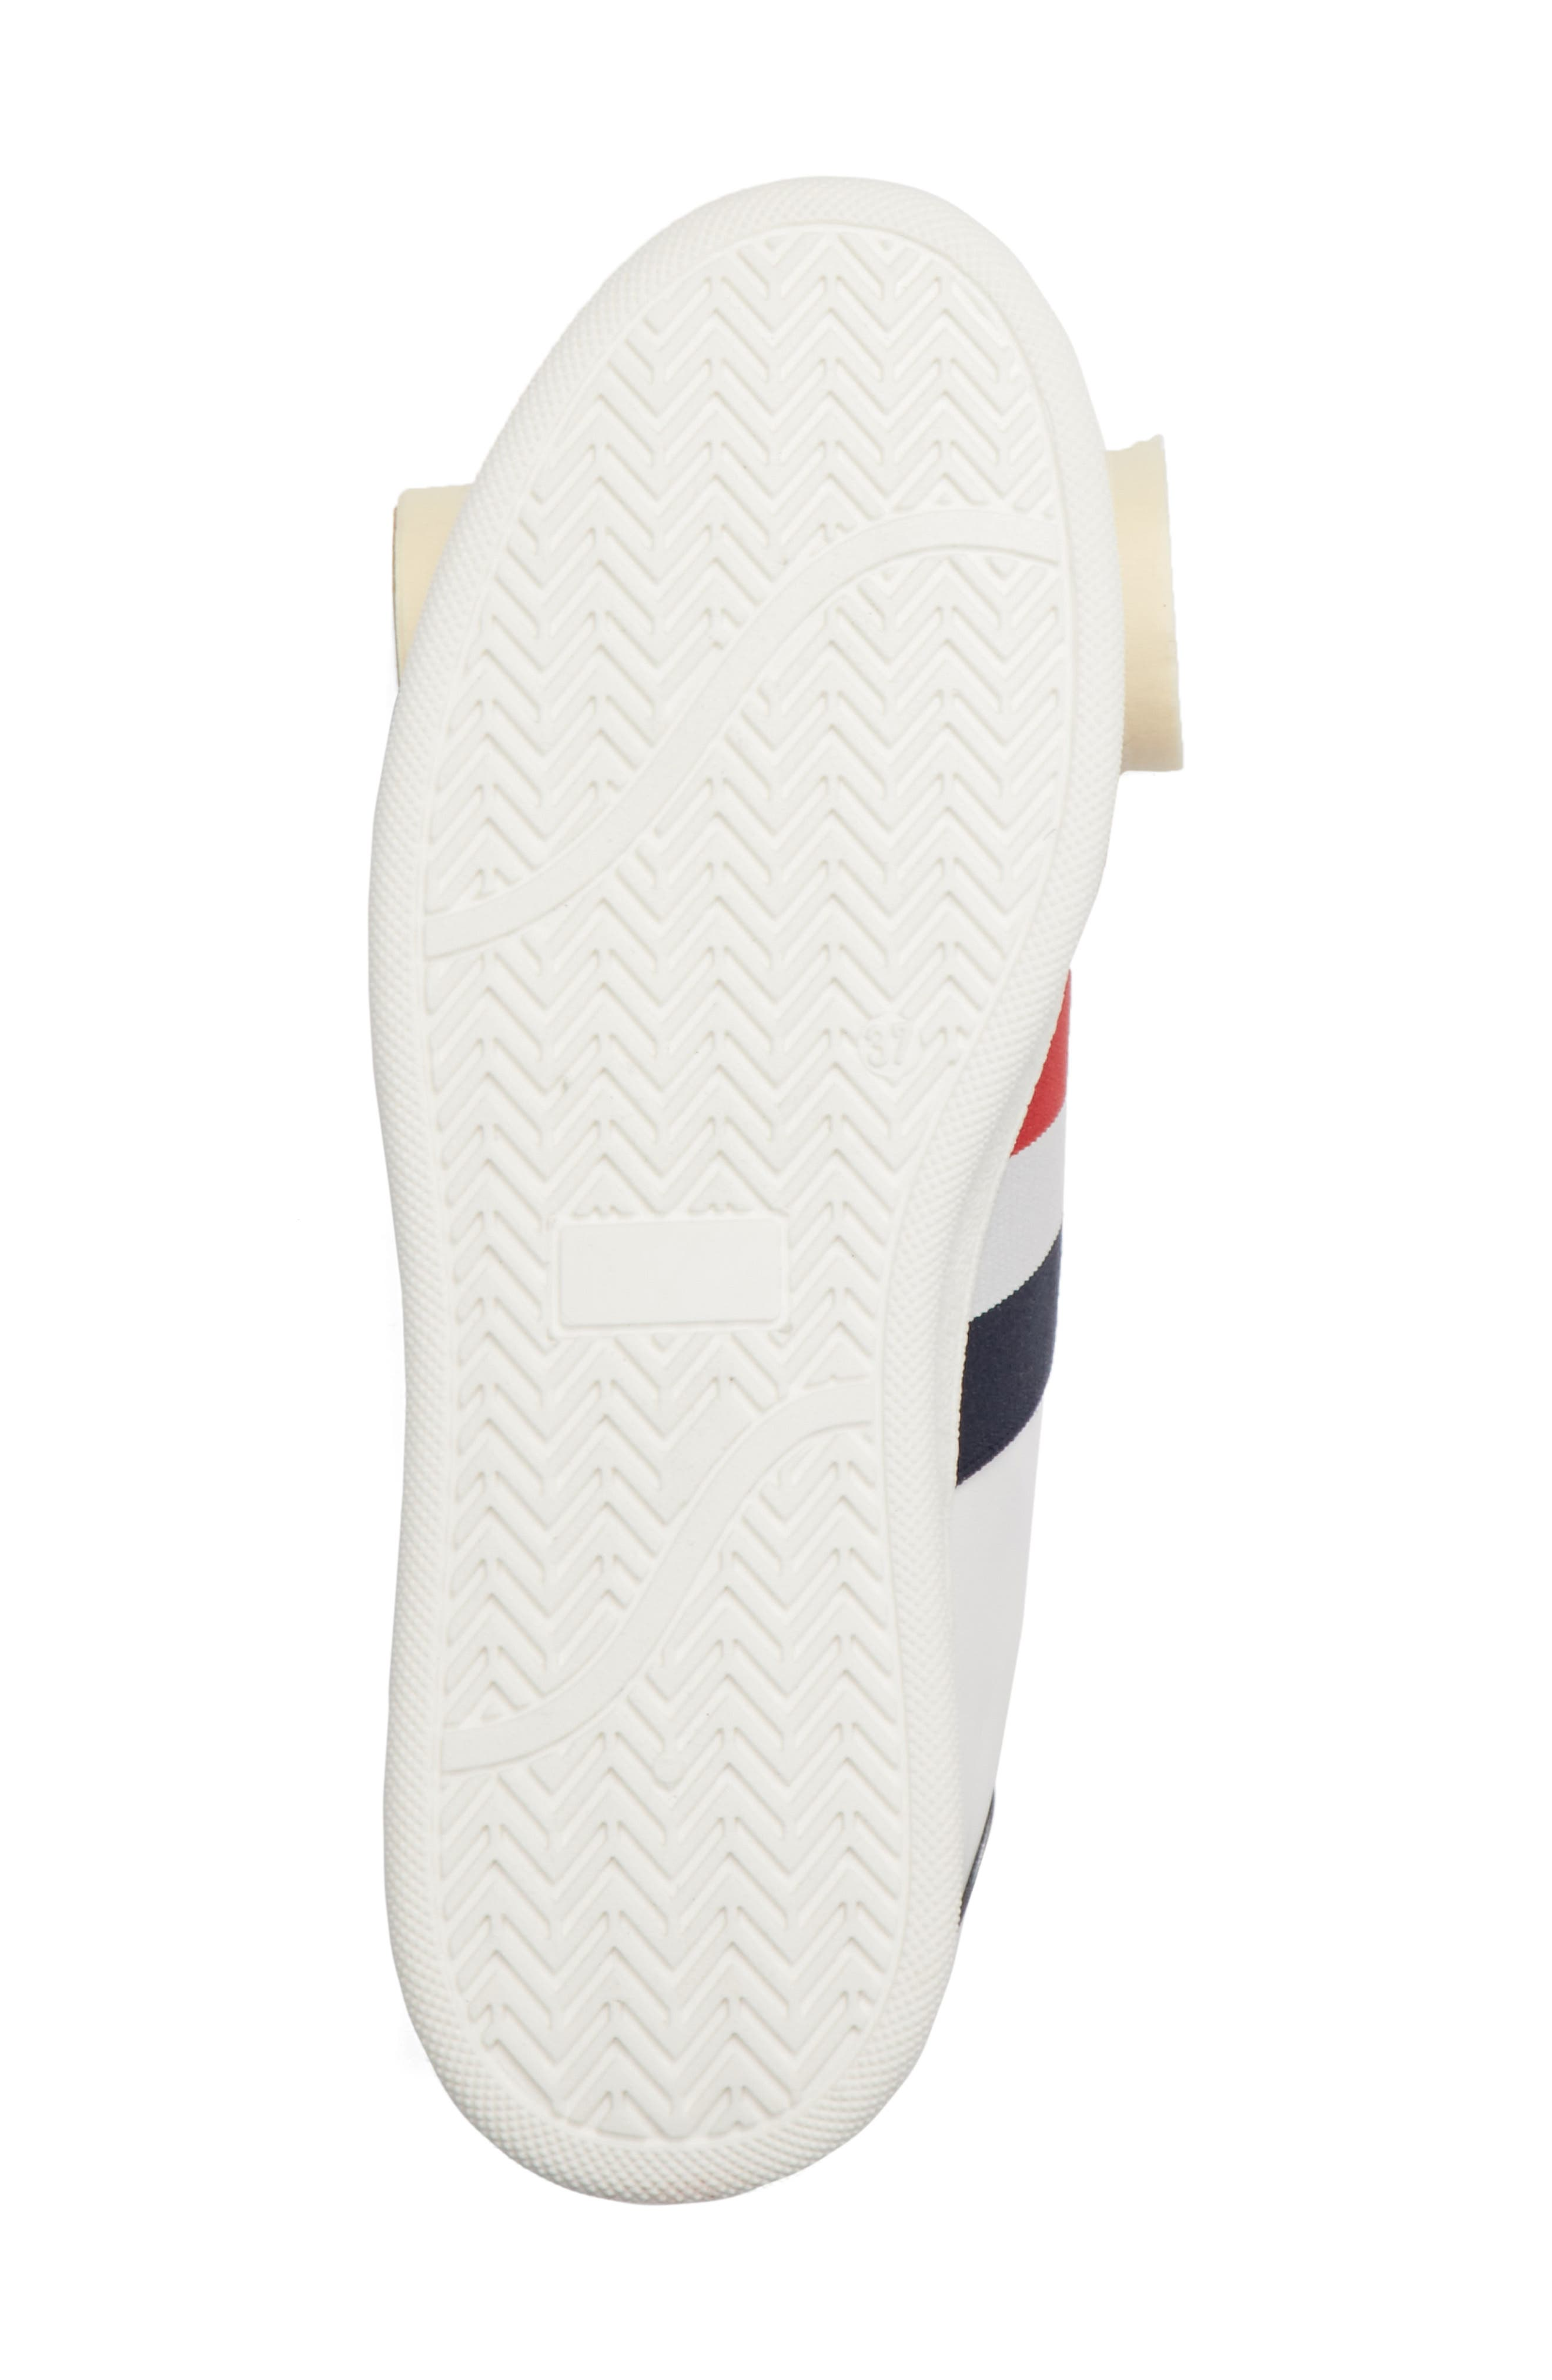 Alizee Low Top Sneaker,                             Alternate thumbnail 6, color,                             White